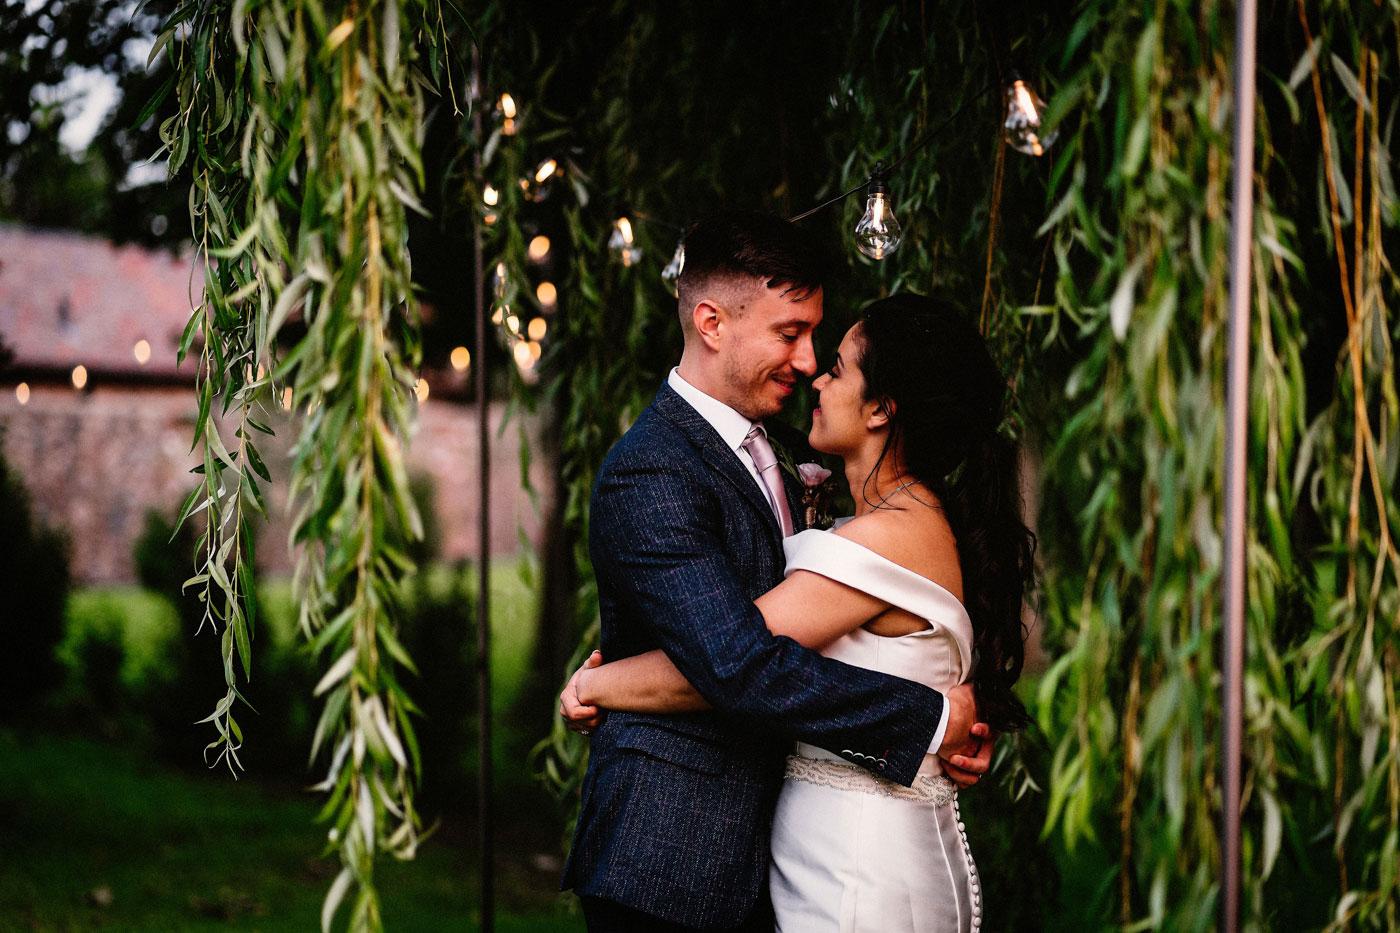 Ella & Dan's, Barns and Yard Wedding